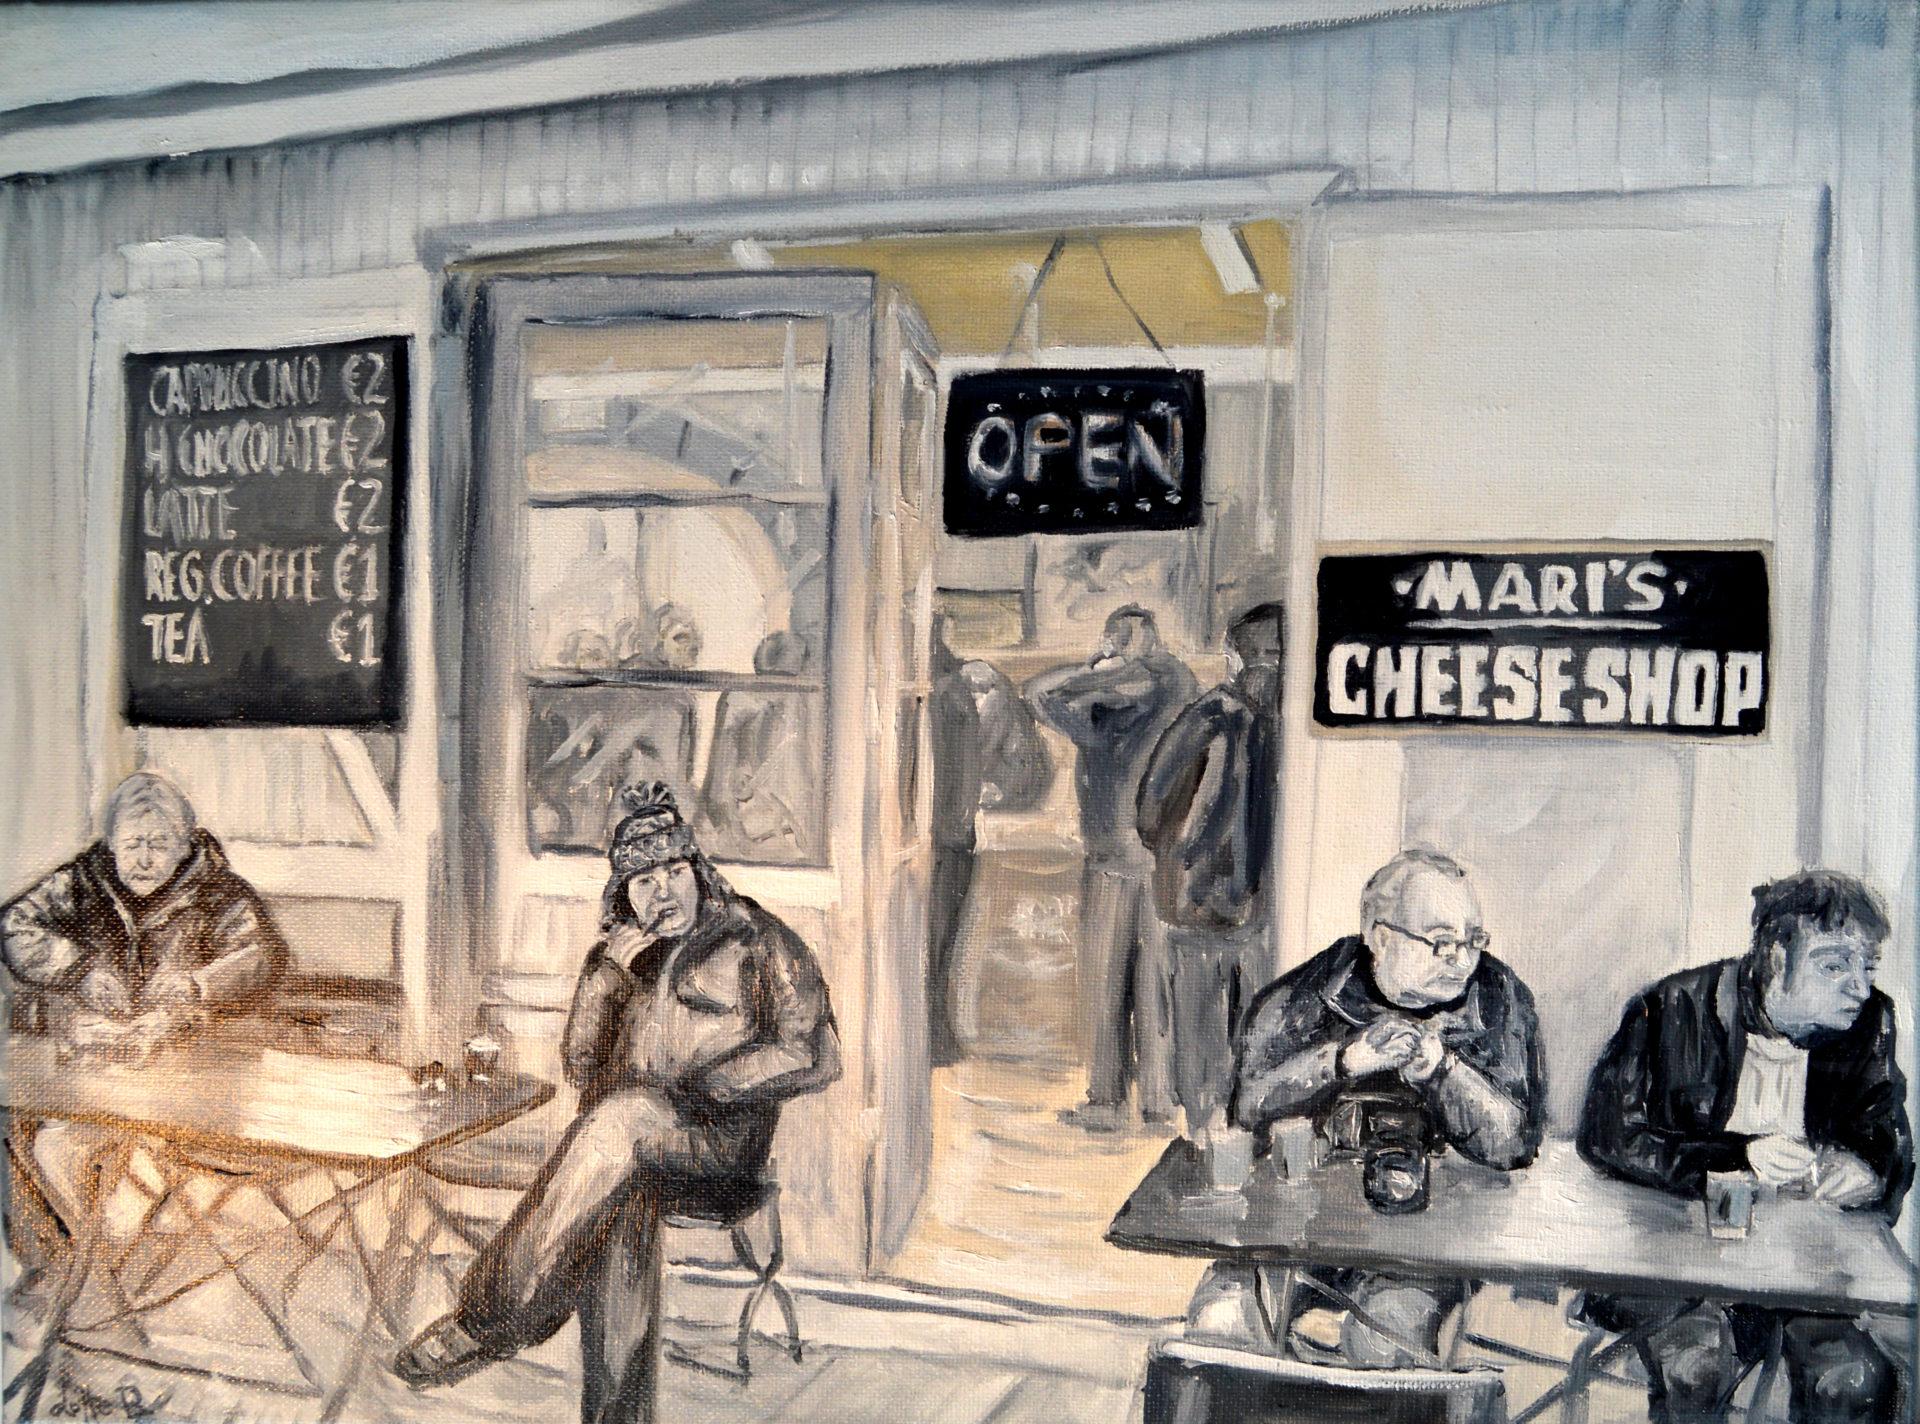 Mari's Cheese Shop